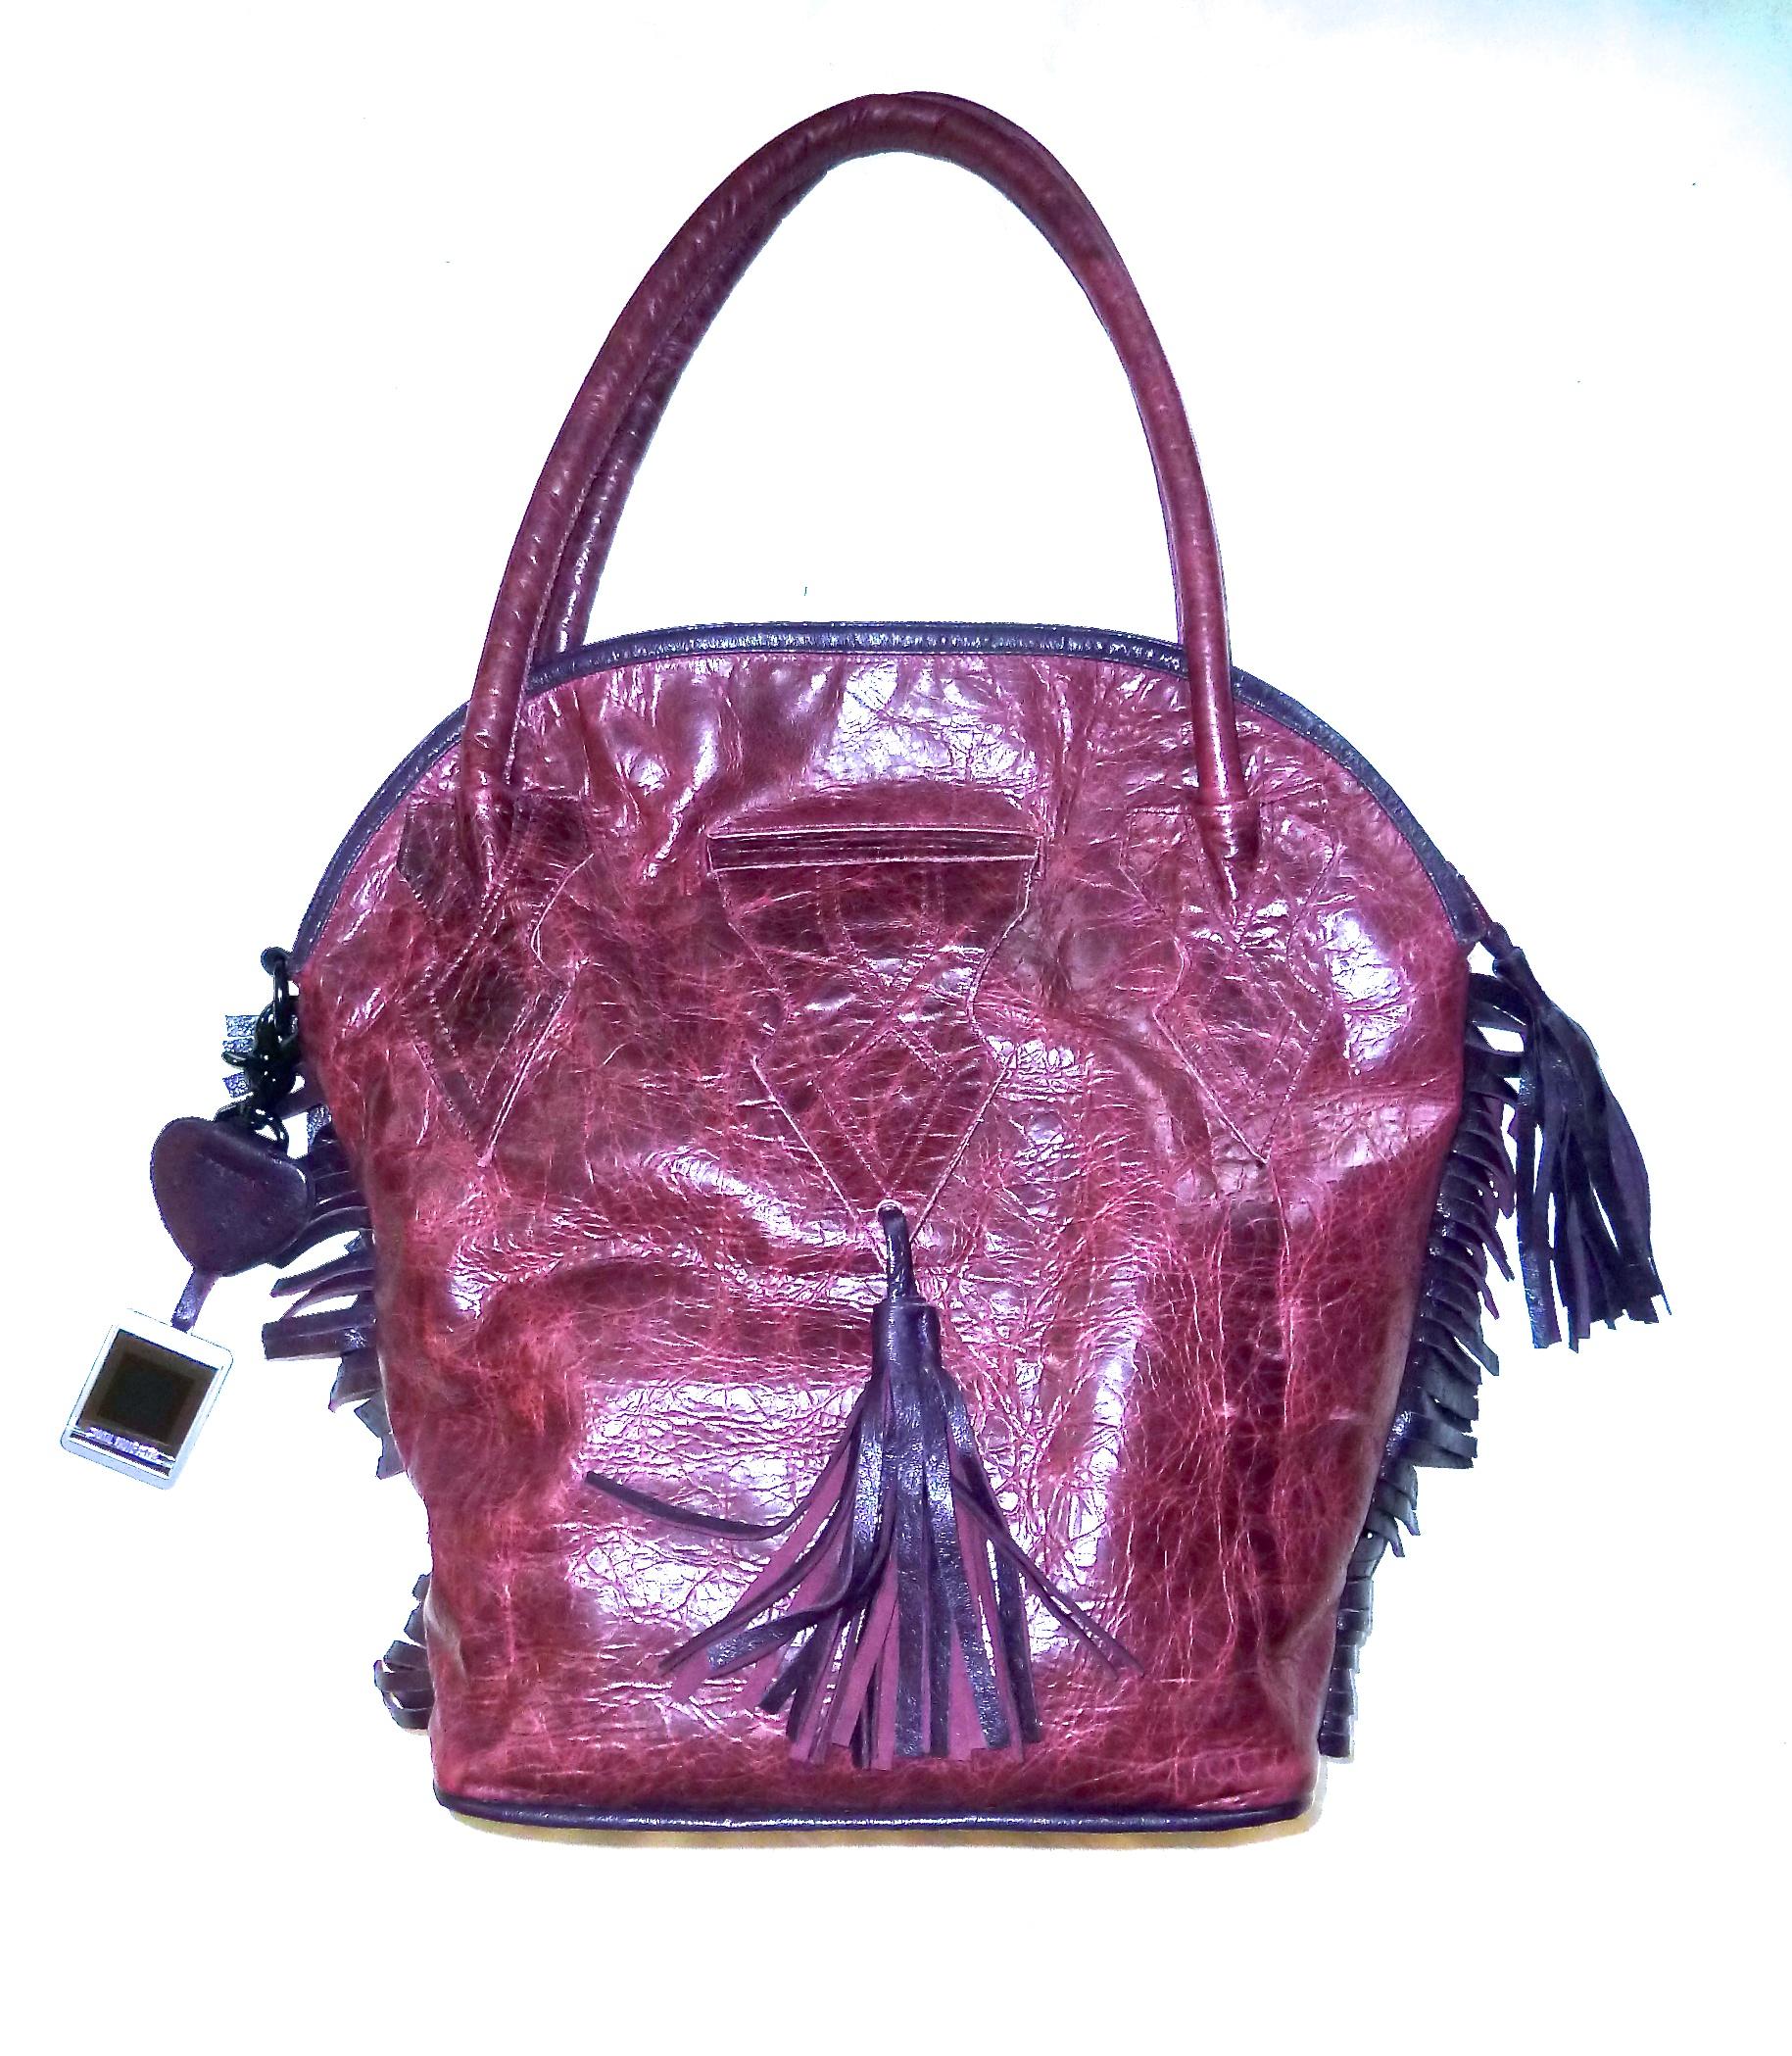 Purses / Bags